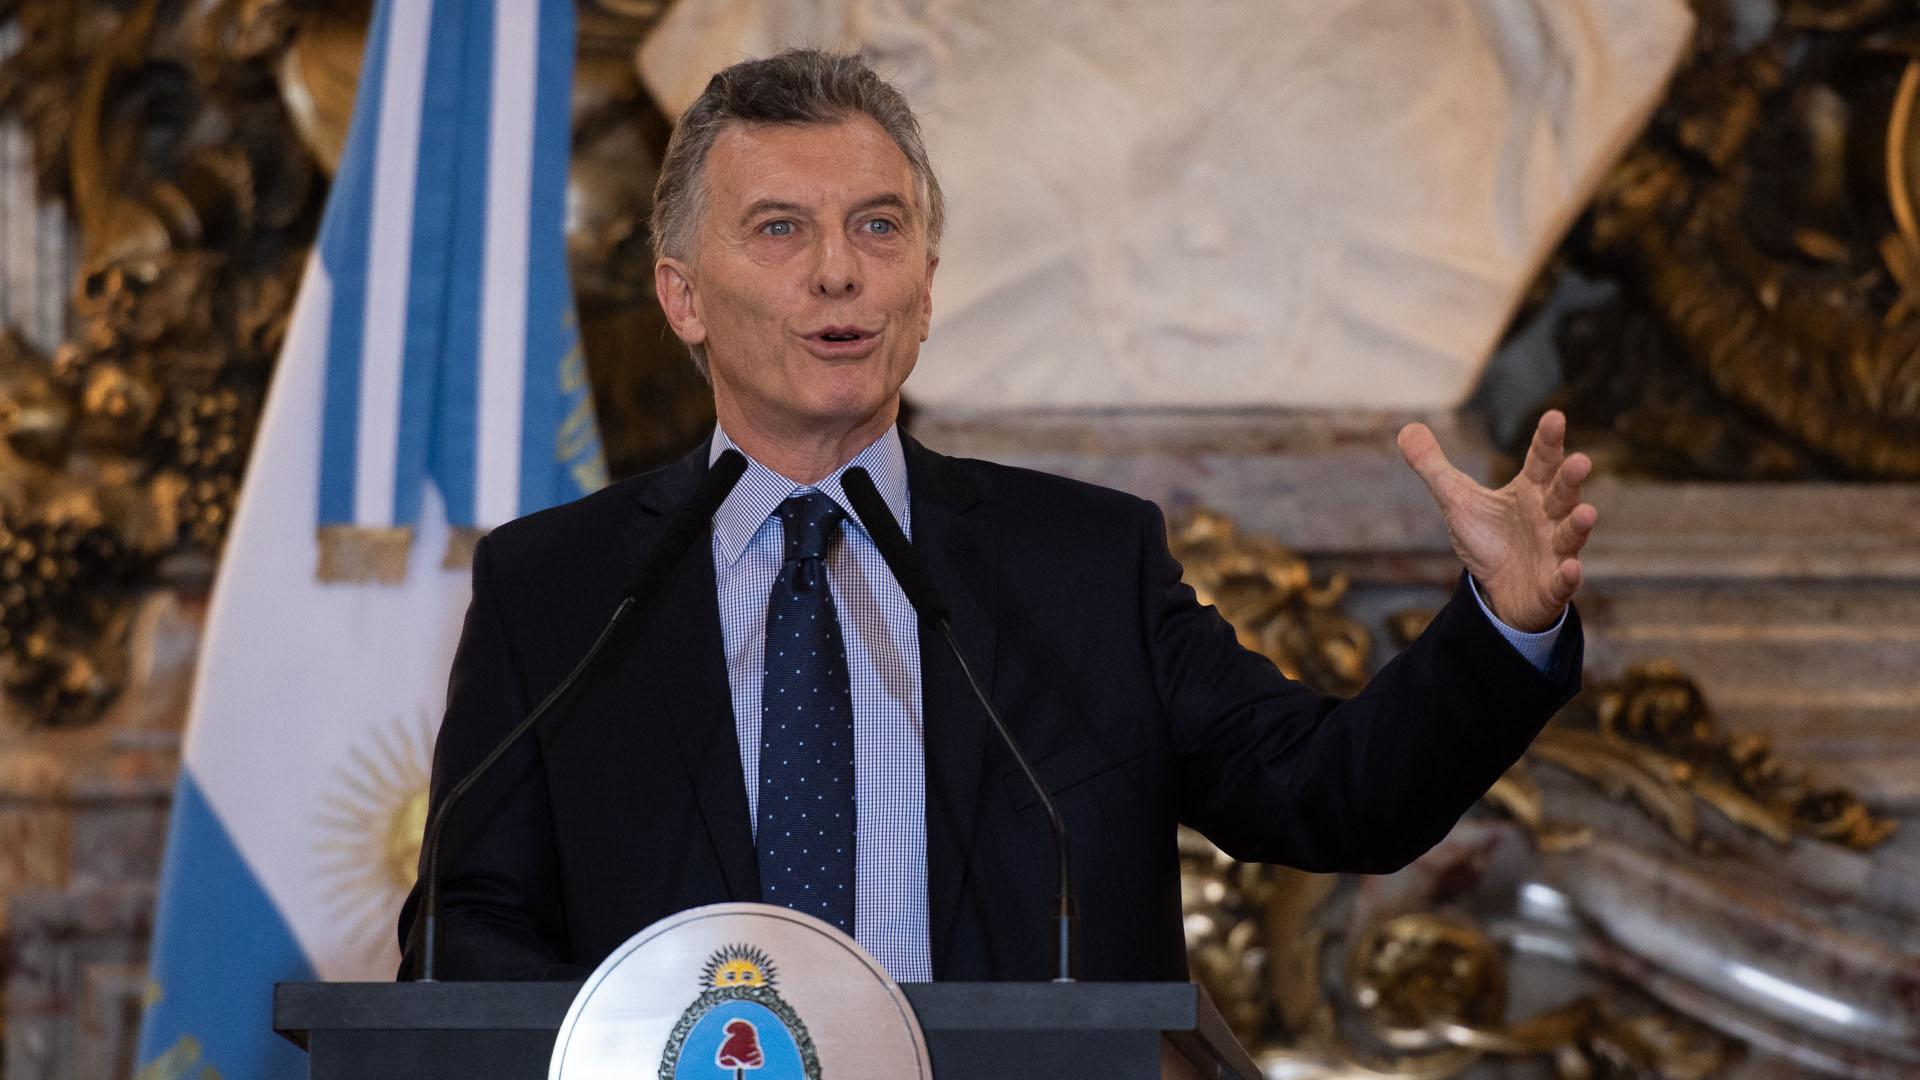 Mauricio Macri (Adrian Escandar)